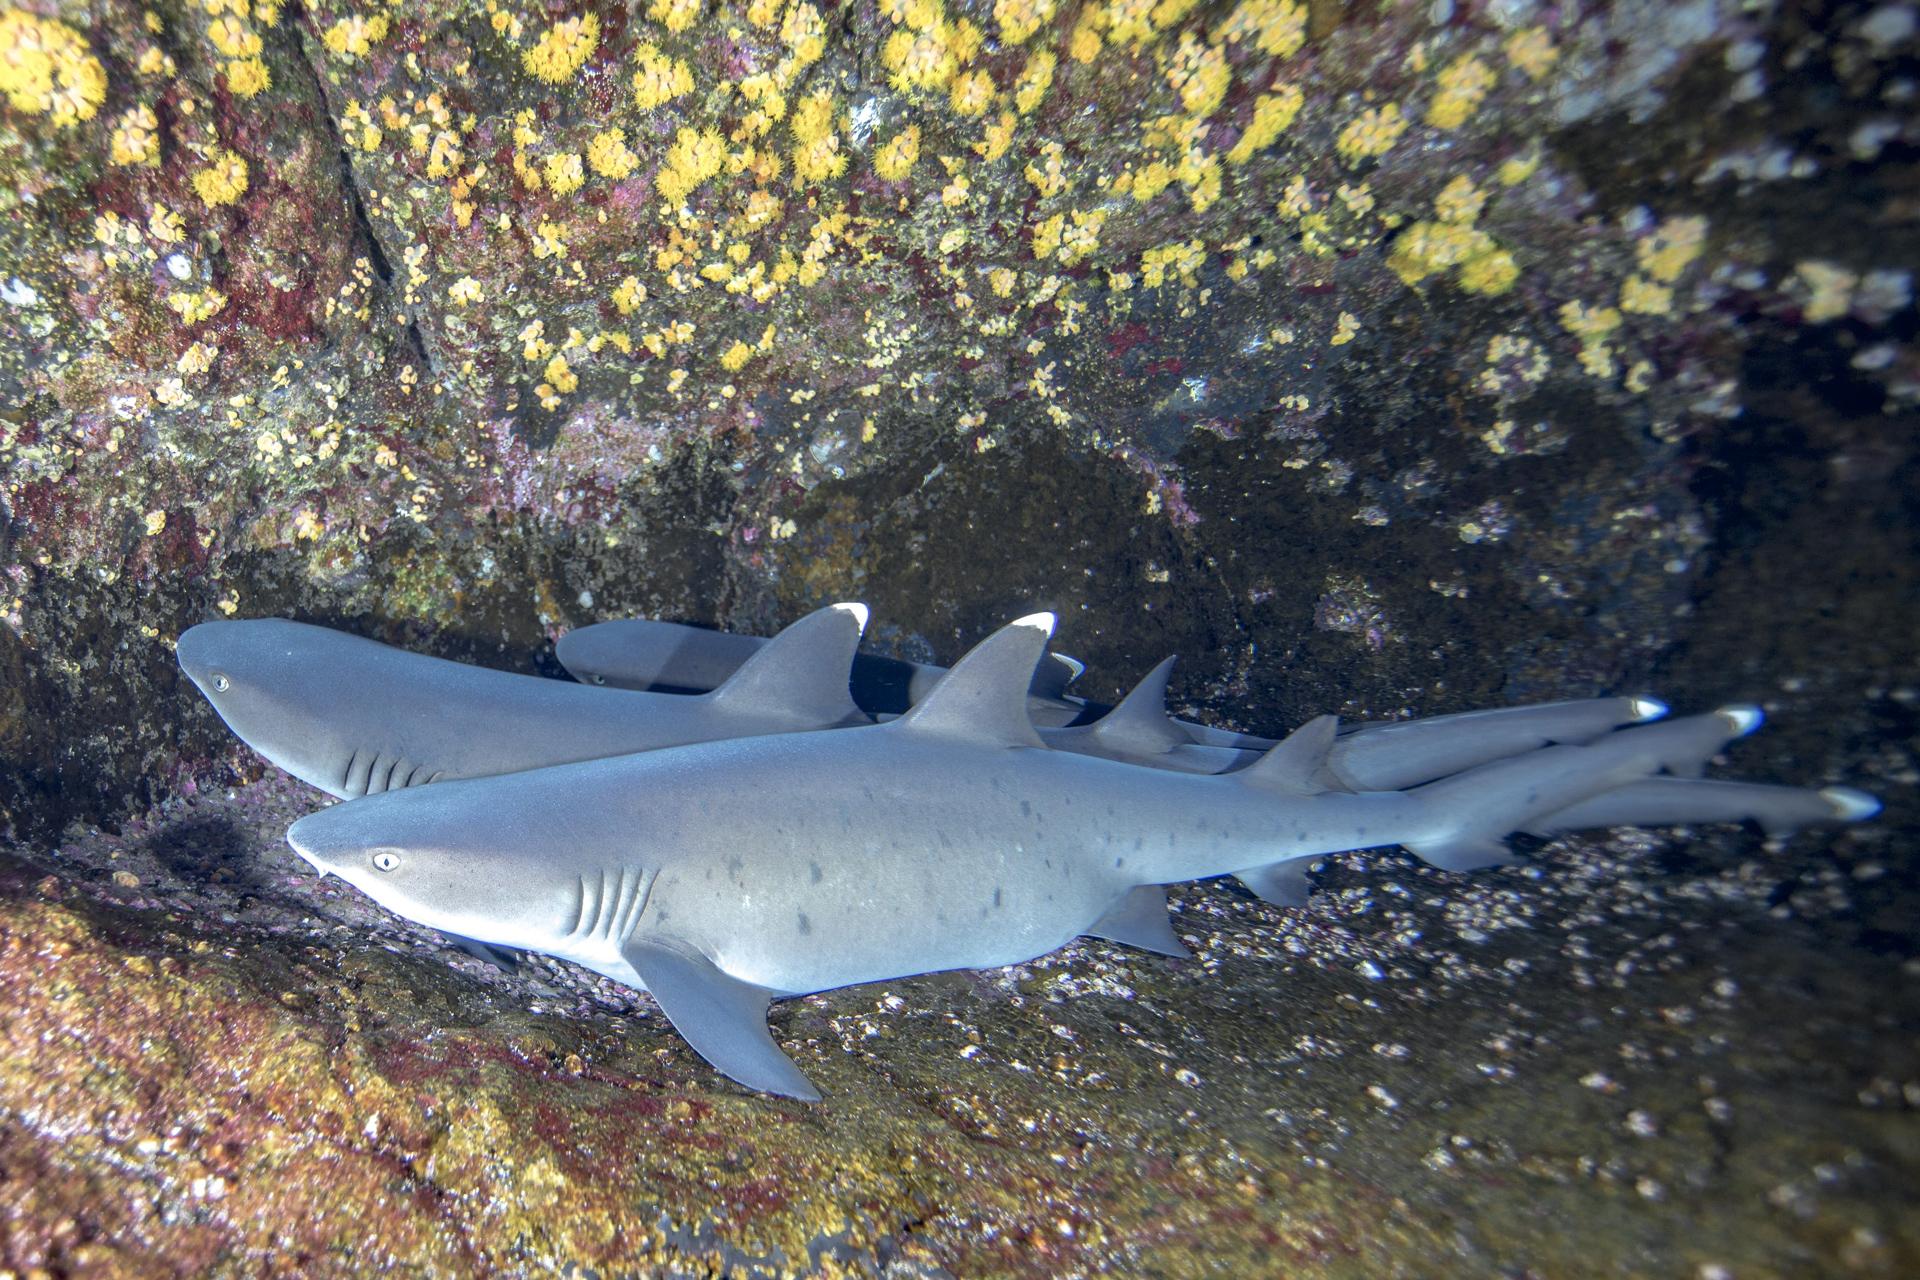 WHITETIP REEF SHARK, SOCORRO CREDIT: DAVID P. ROBINSON, PHD / coral reef image bank